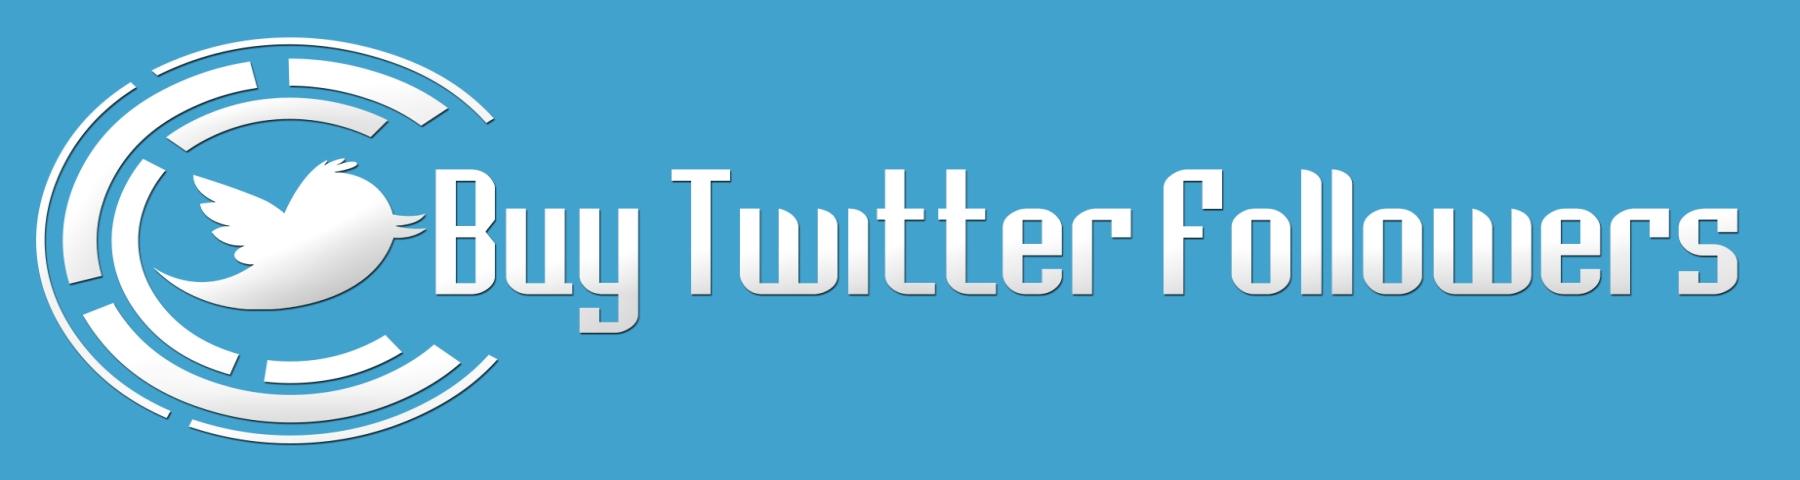 5000+ Twitter